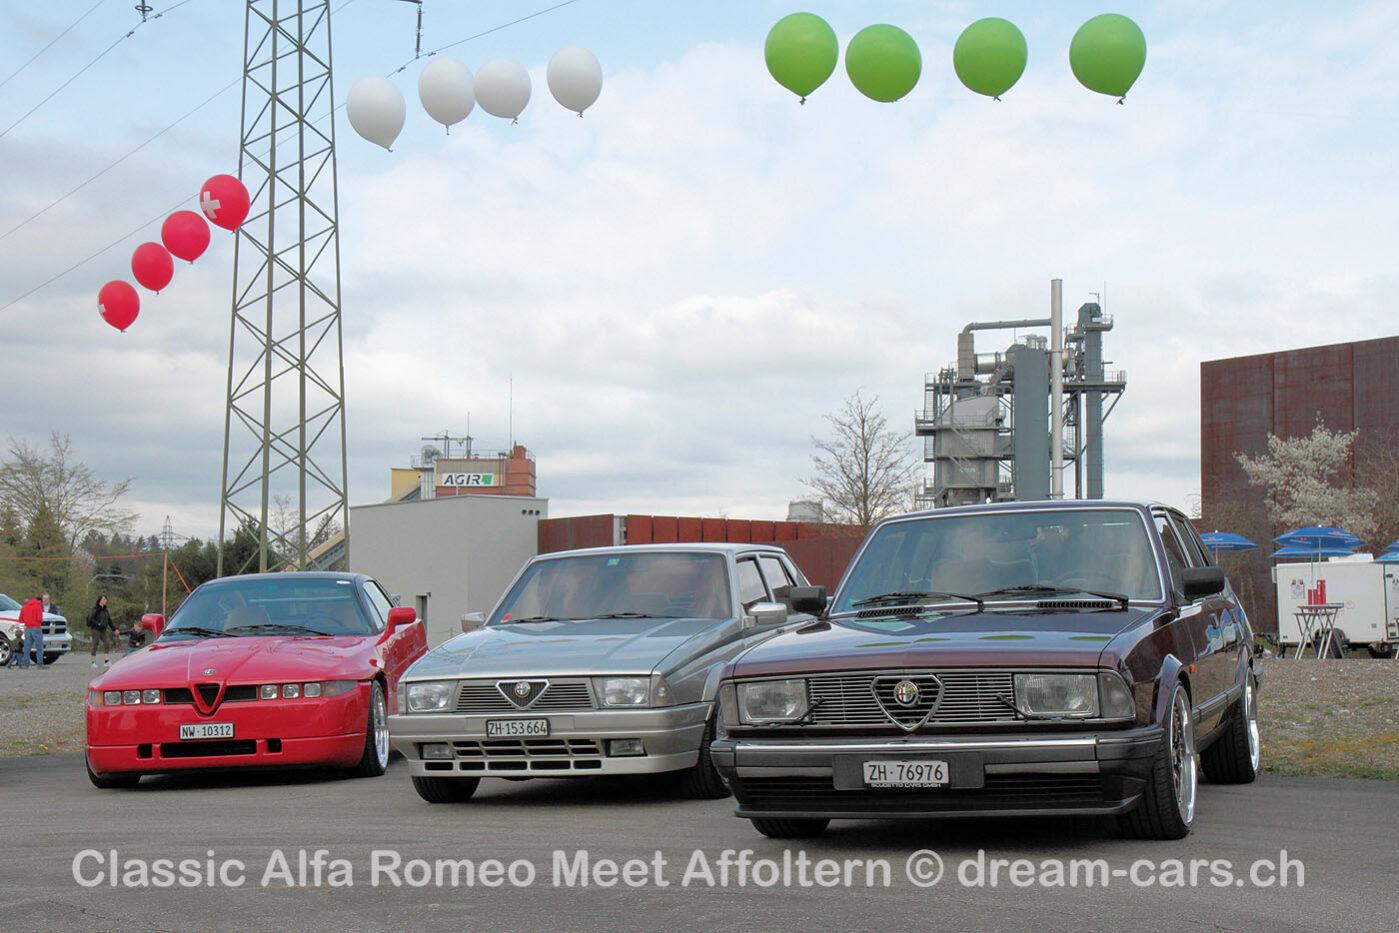 CARM Classic Alfa Romeo Meeting Affoltern 2019